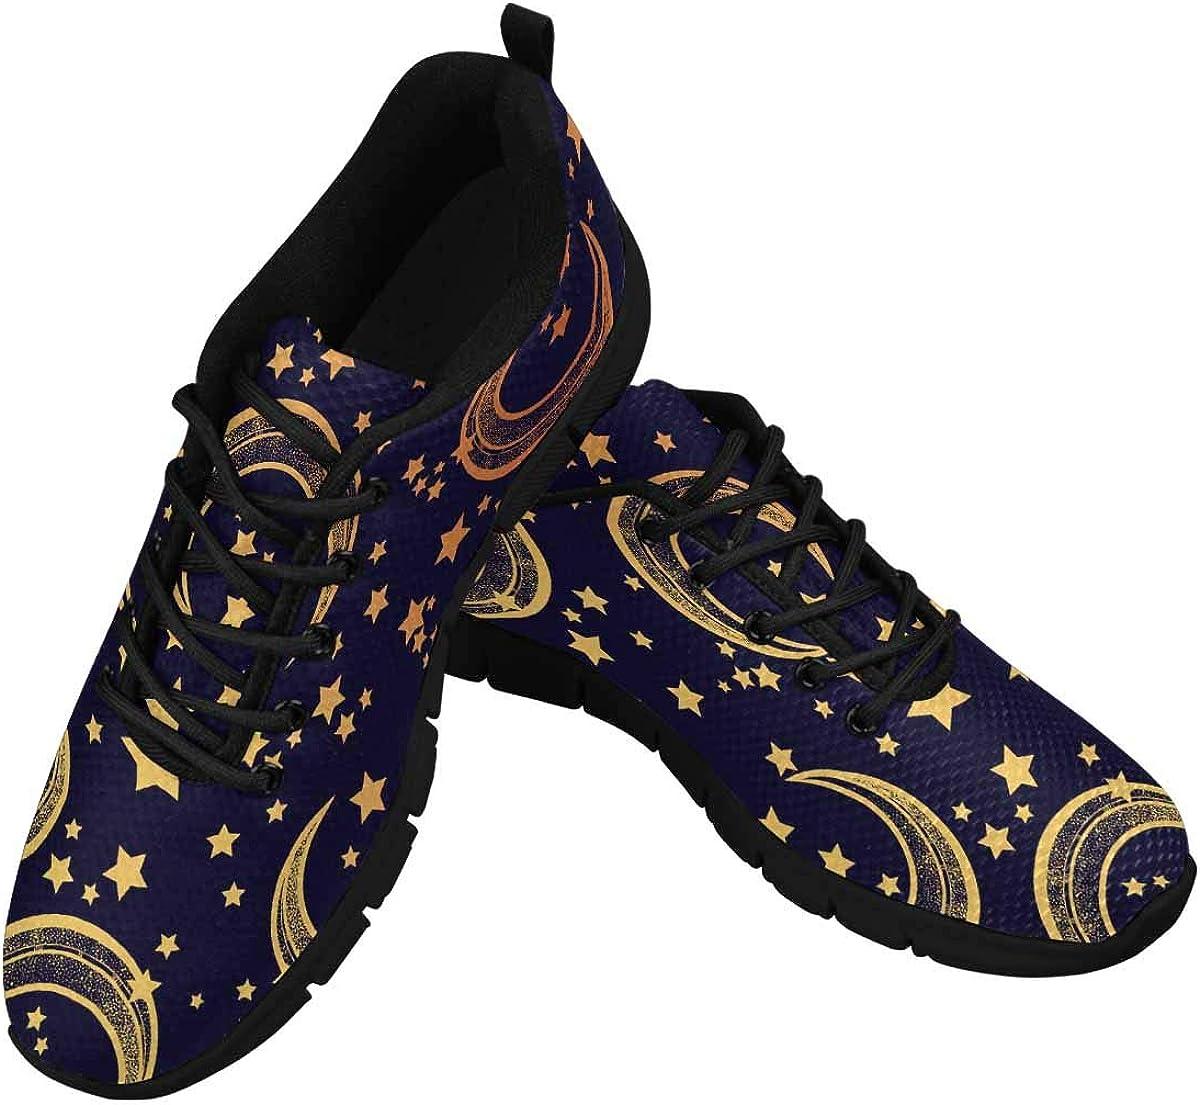 InterestPrint Moon with Stars Women's Athletic Walking Shoes Breathe Comfort Mesh